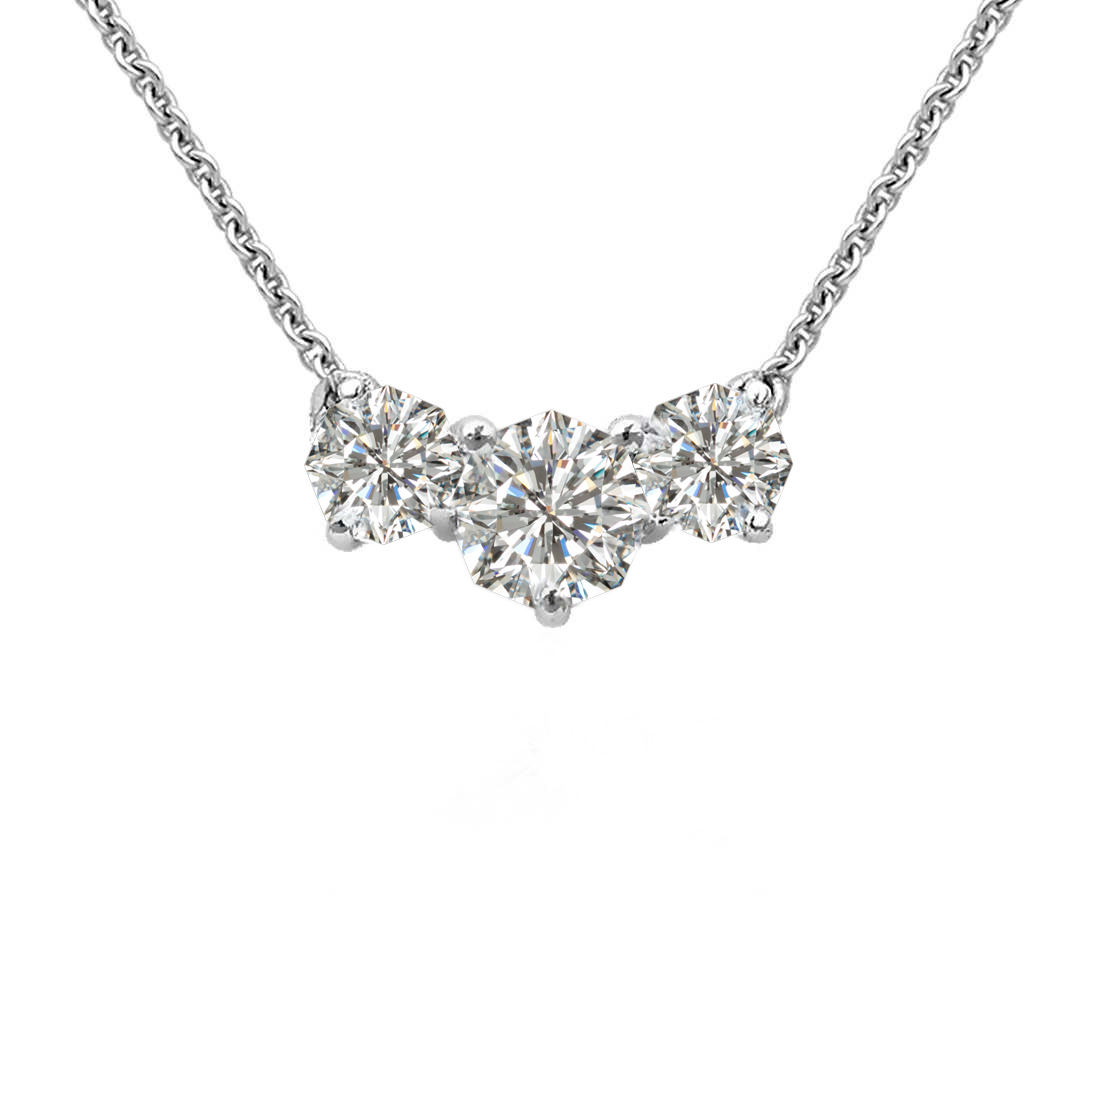 88-cut-three-stone-pendant.jpg